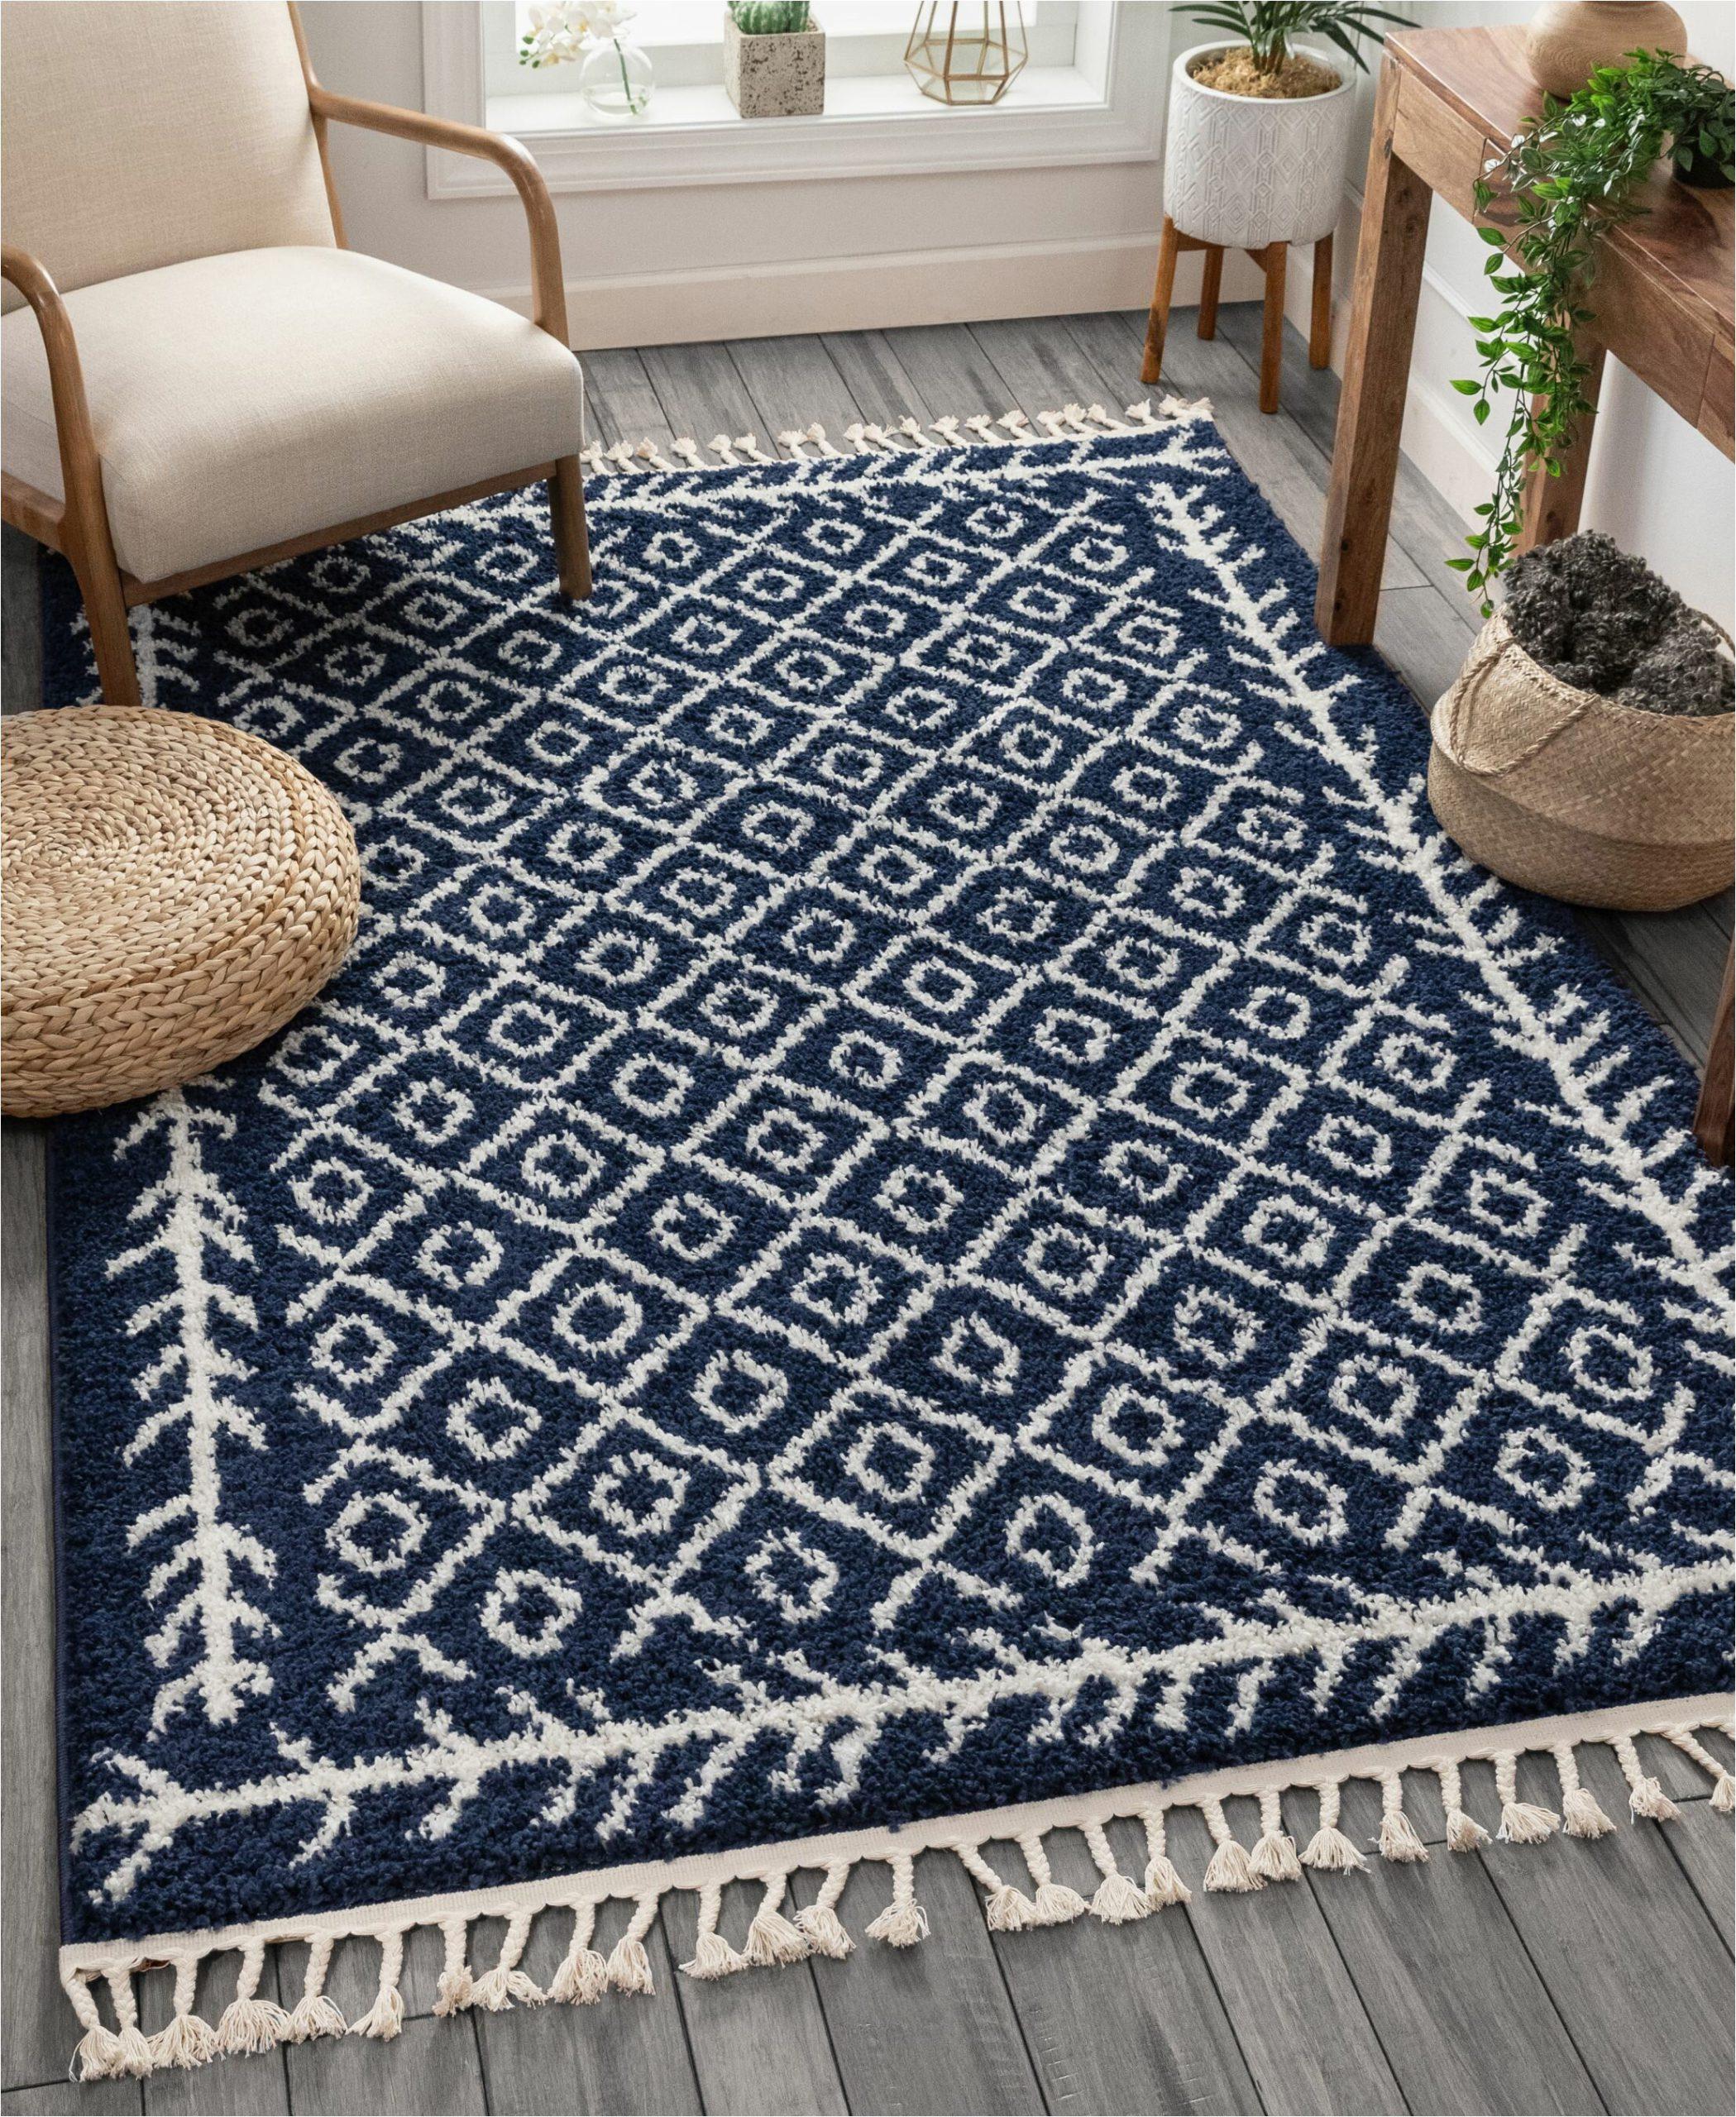 cabana geometric bluewhite area rug